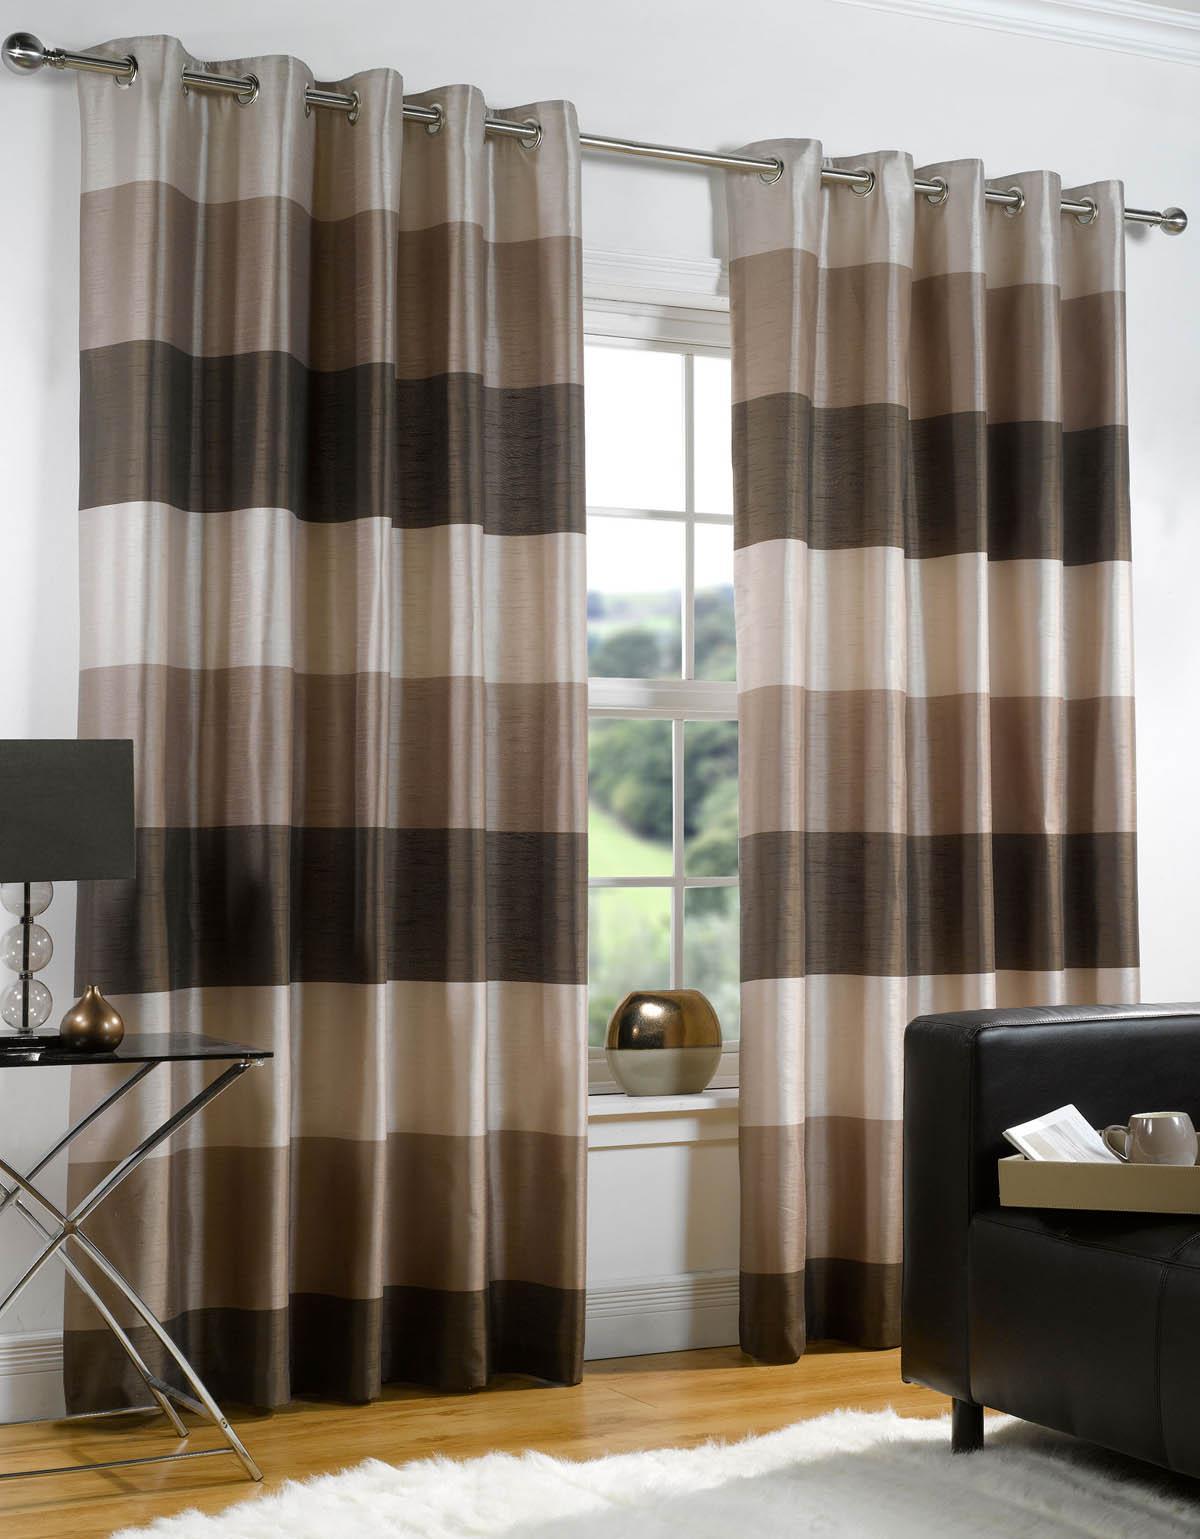 Rio-Chocolate 20+ Hottest Curtain Design Ideas for 2021